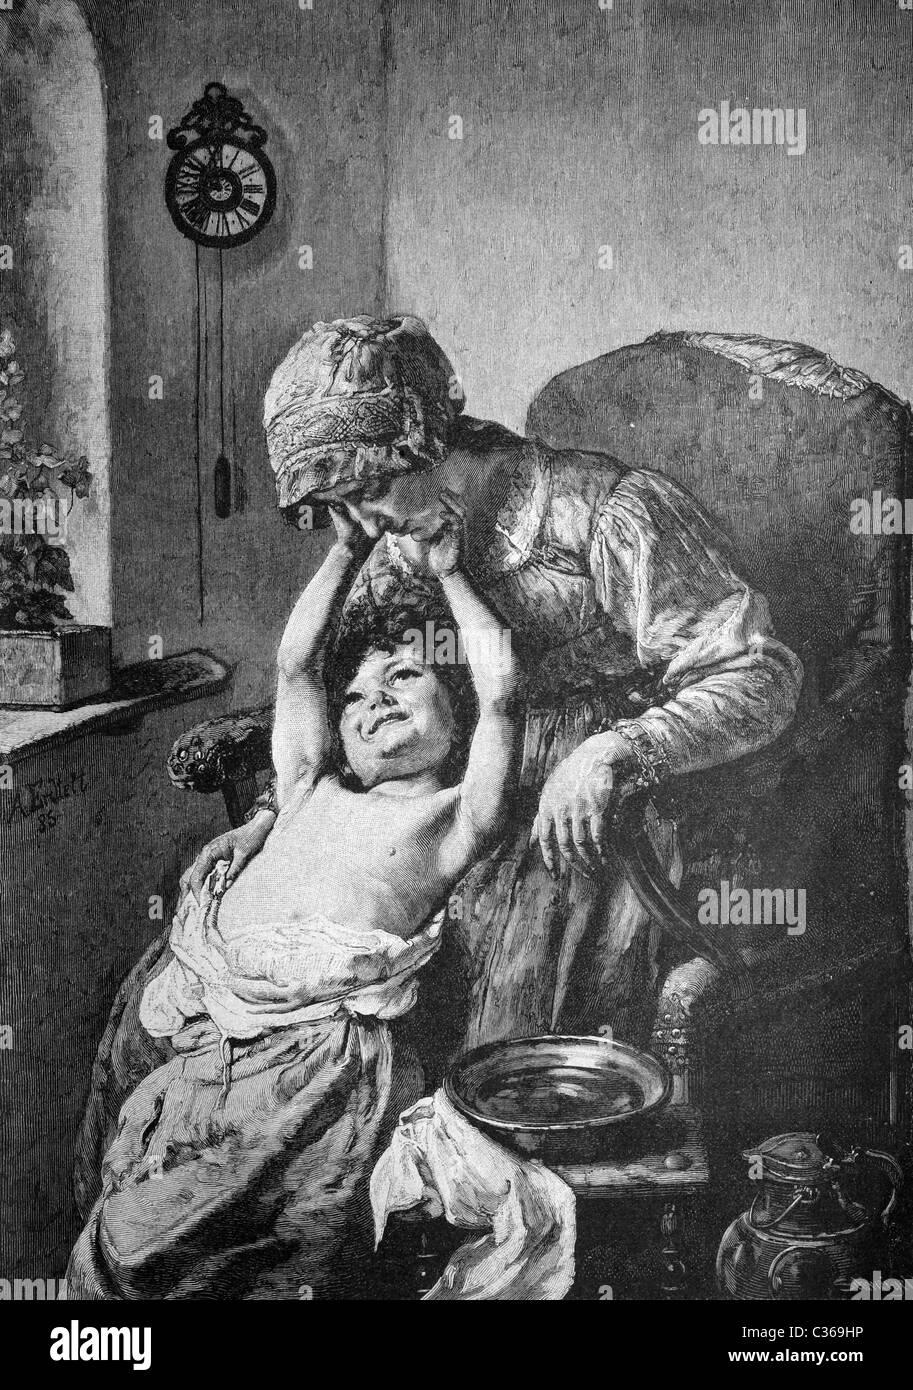 washing in the morning, historical image 1886 - Stock Image